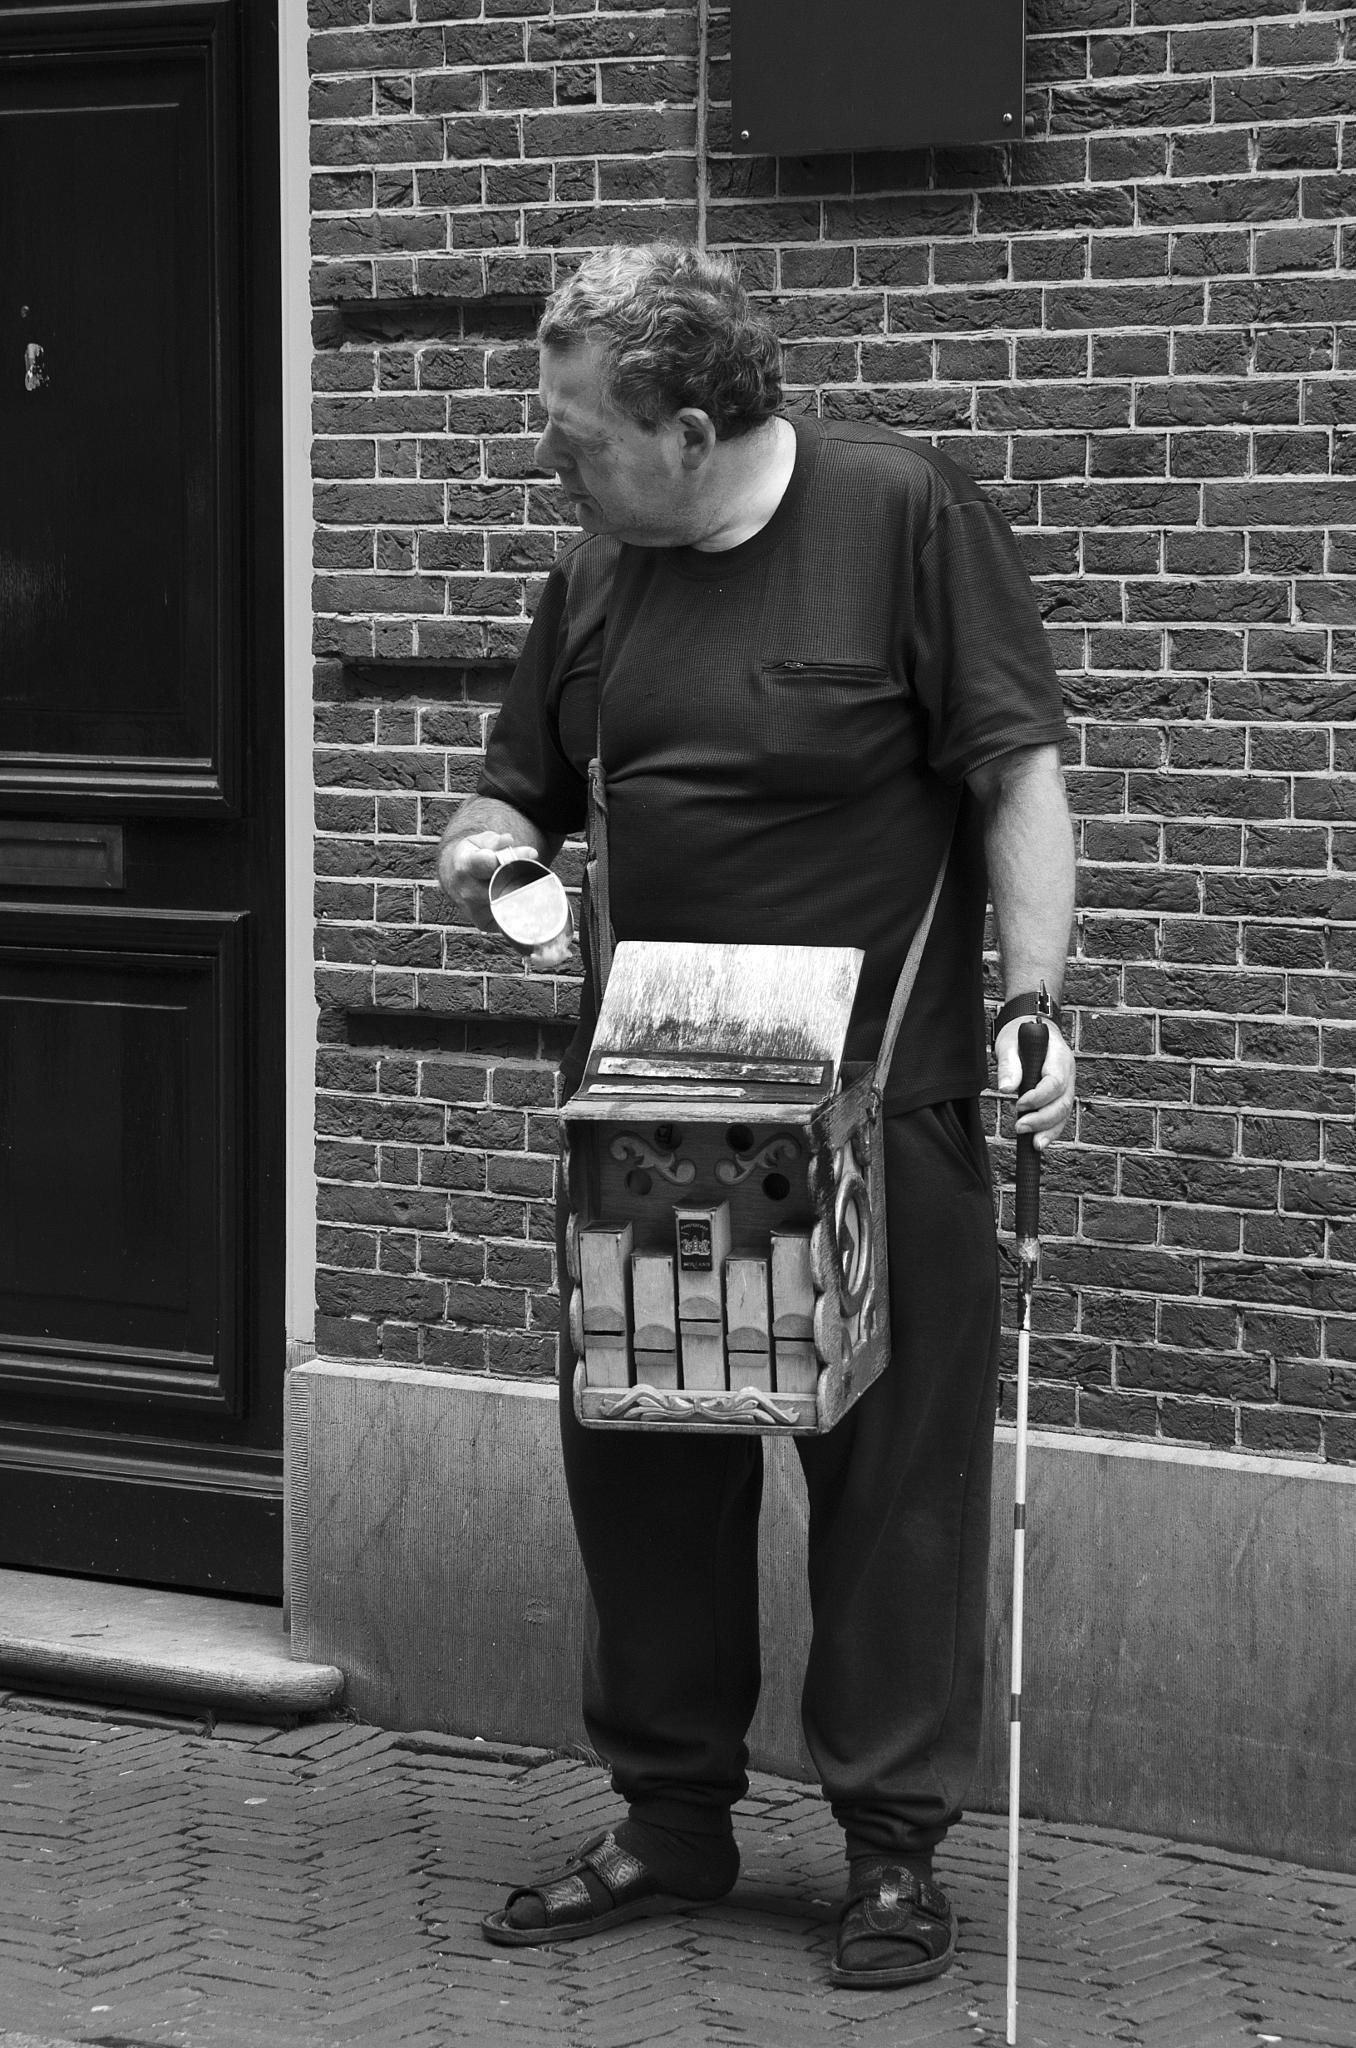 music man Amsterdam by GreenLady121